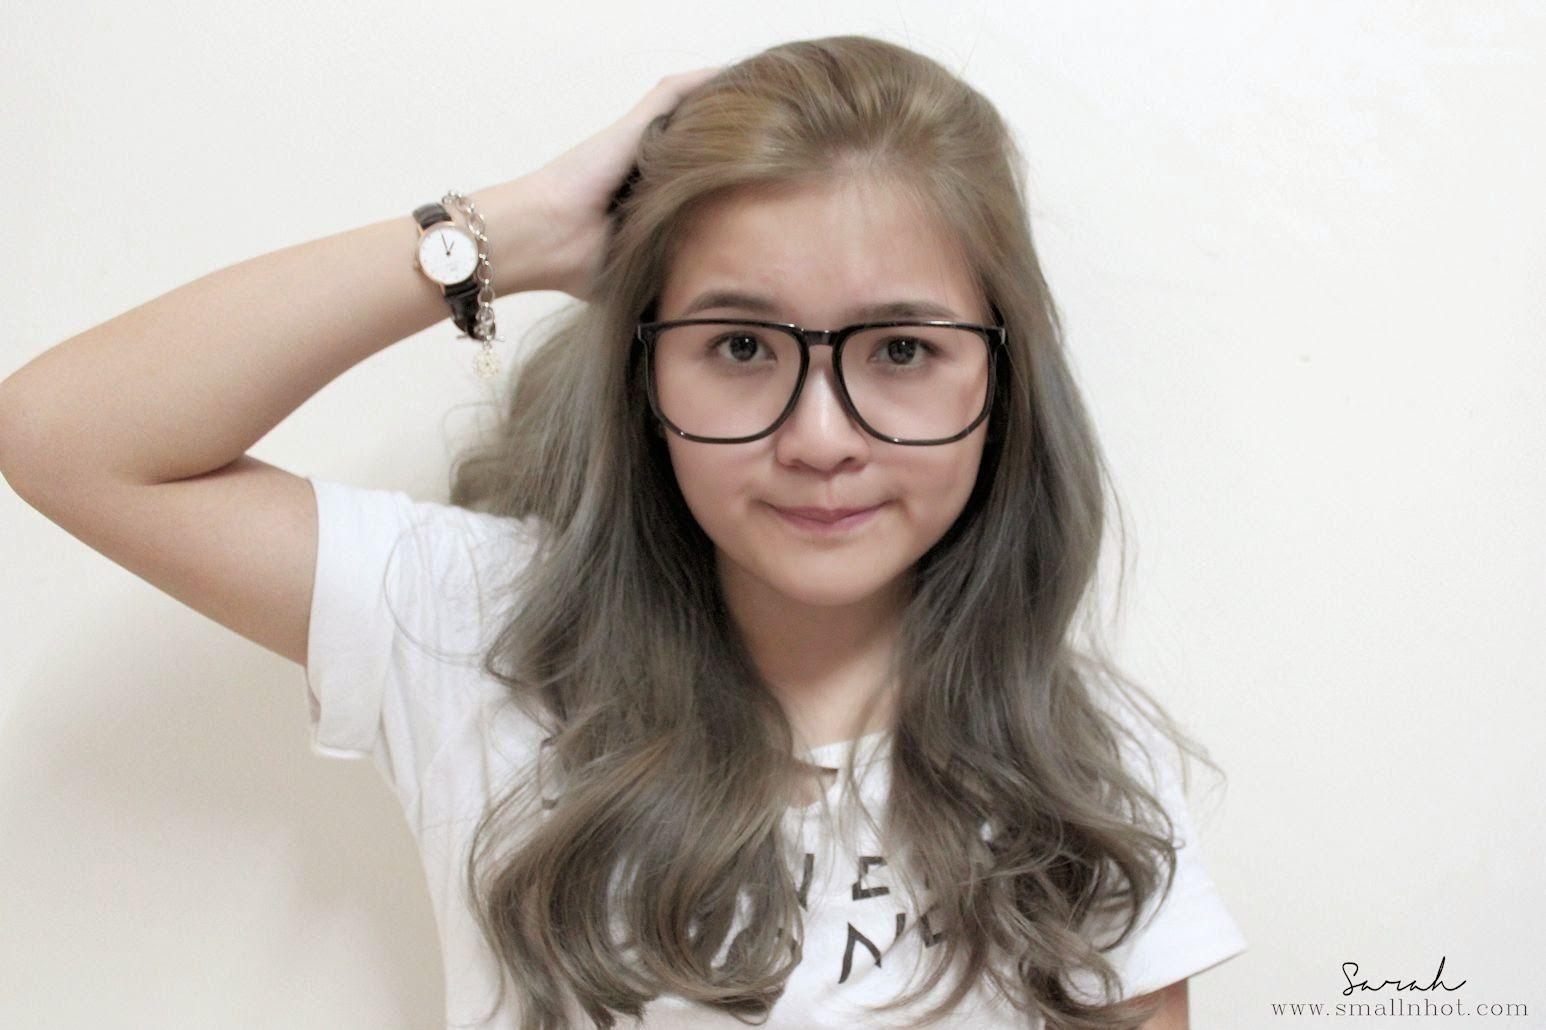 Pin By Jooana On Hair Color Ideas Pinterest Hair Dye And Hair